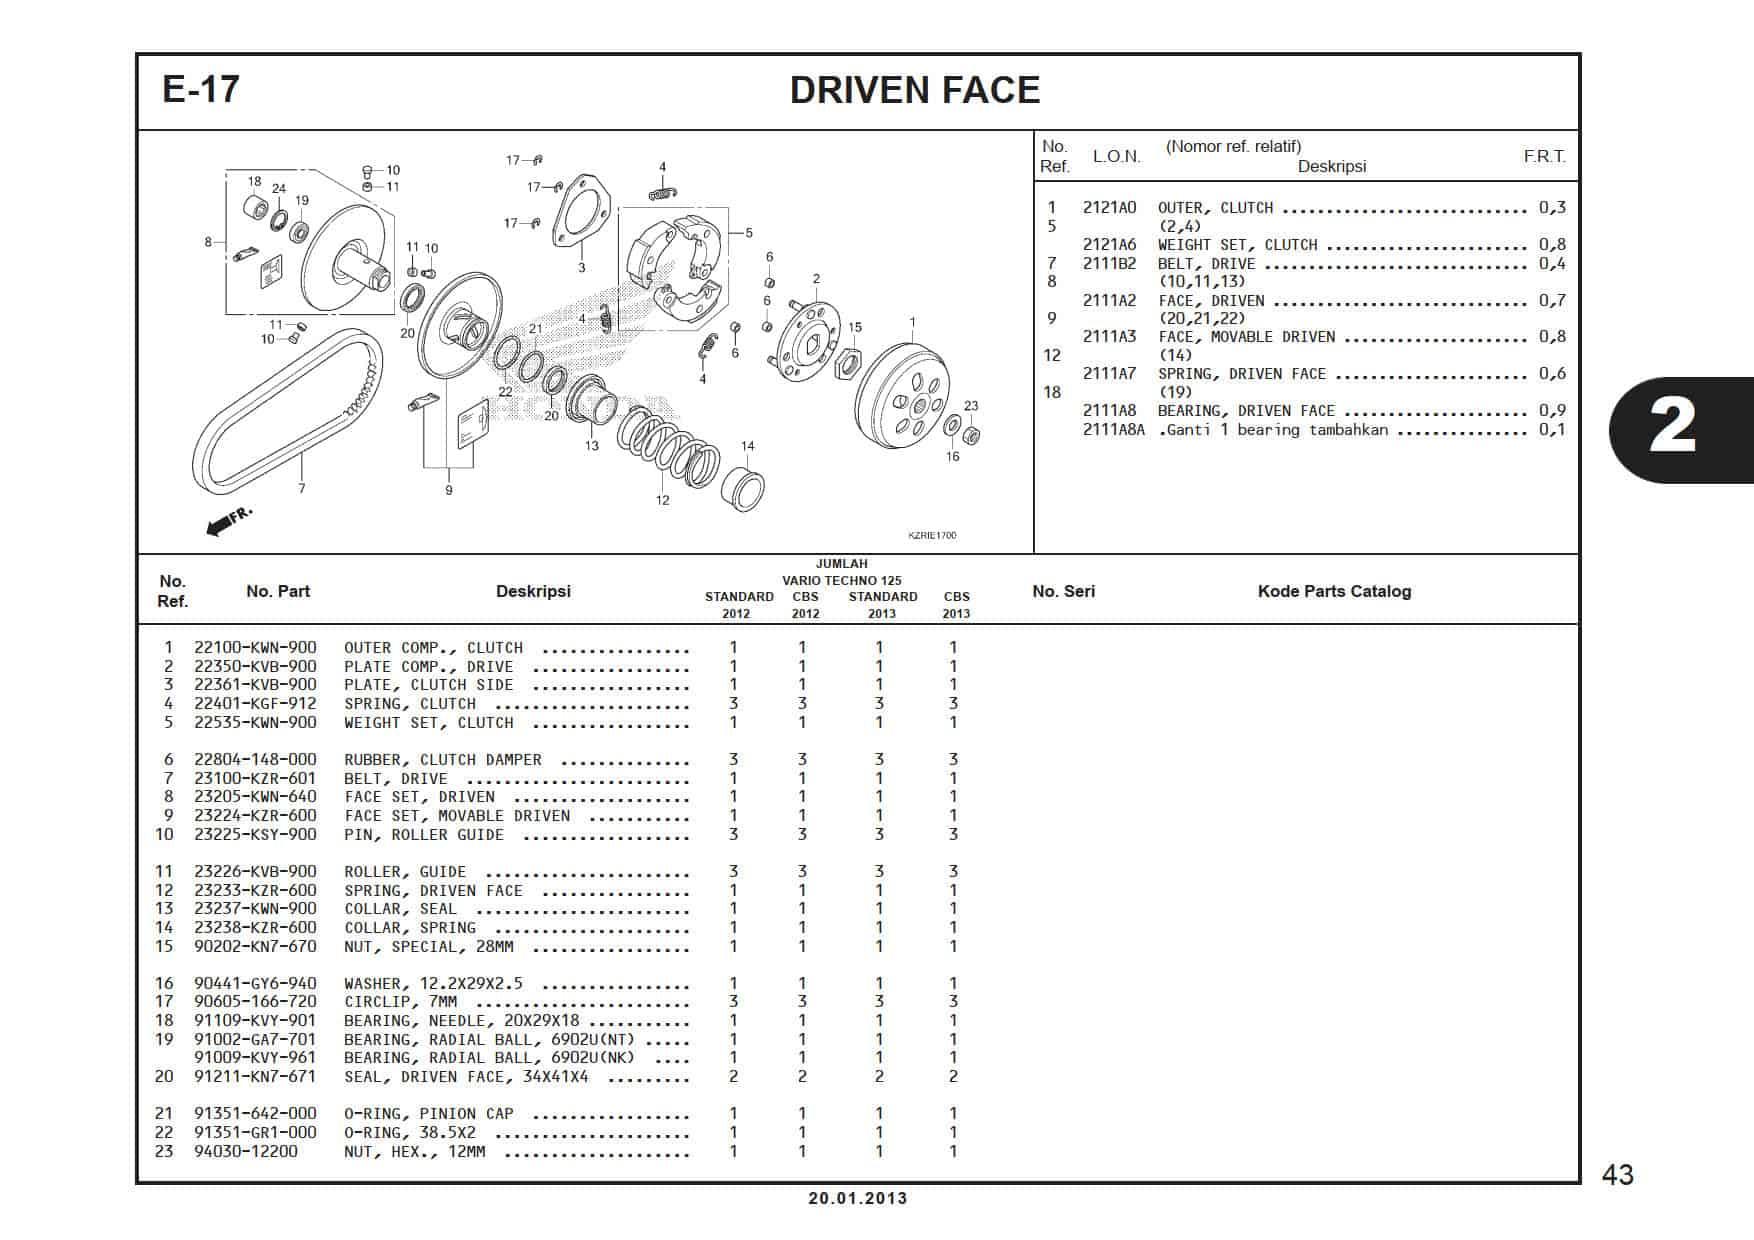 E-17 Driven Face